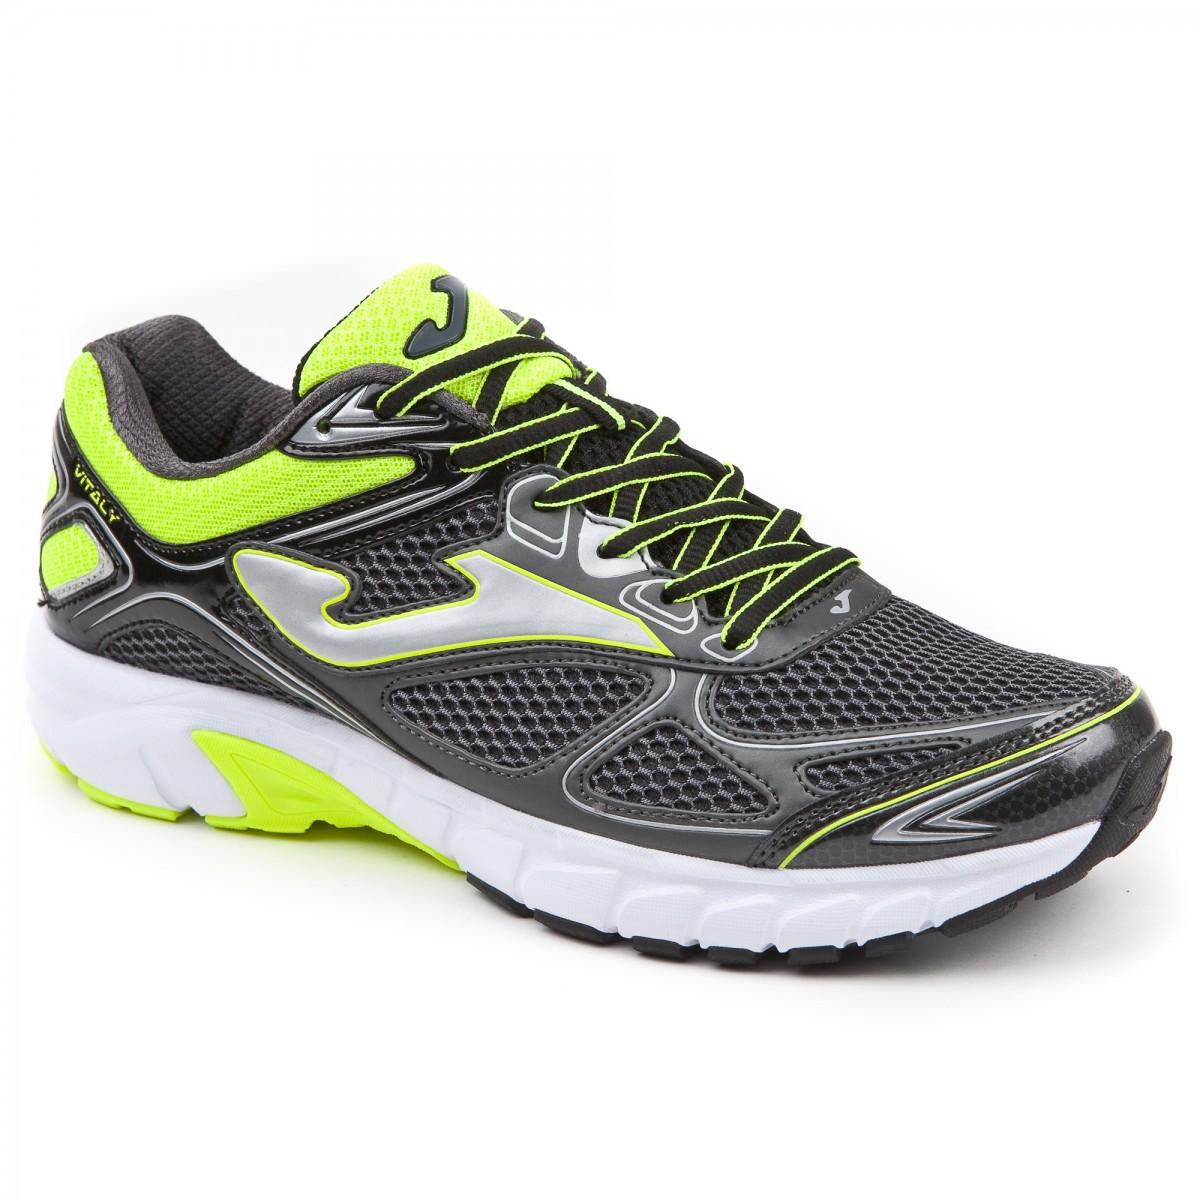 R.Vitaly Man scarpa running uomo